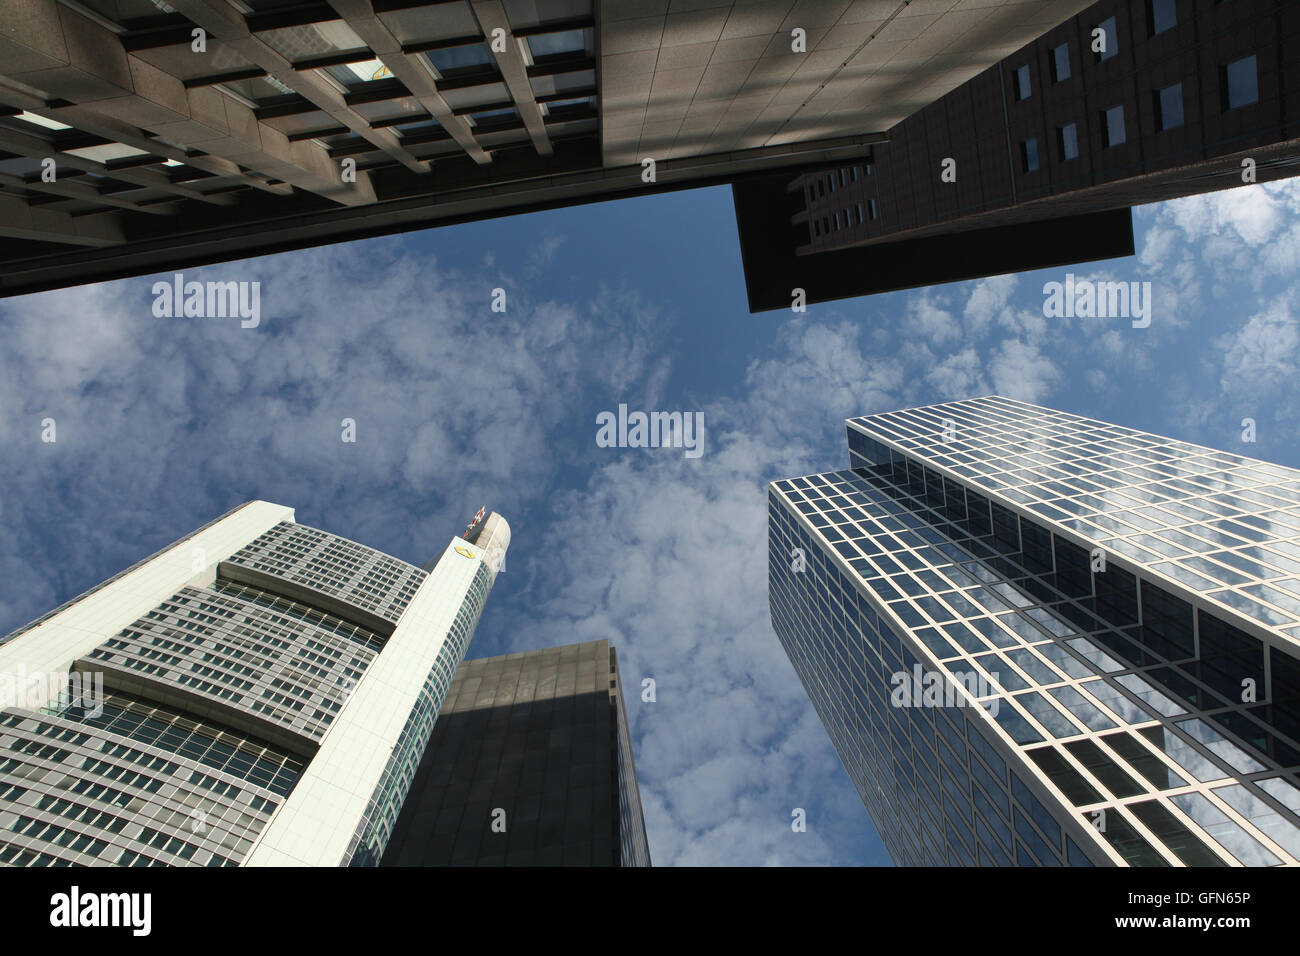 Modern skyscrapers in the Bankenviertel (banking district) in Frankfurt am Main, Hesse, Germany. - Stock Image